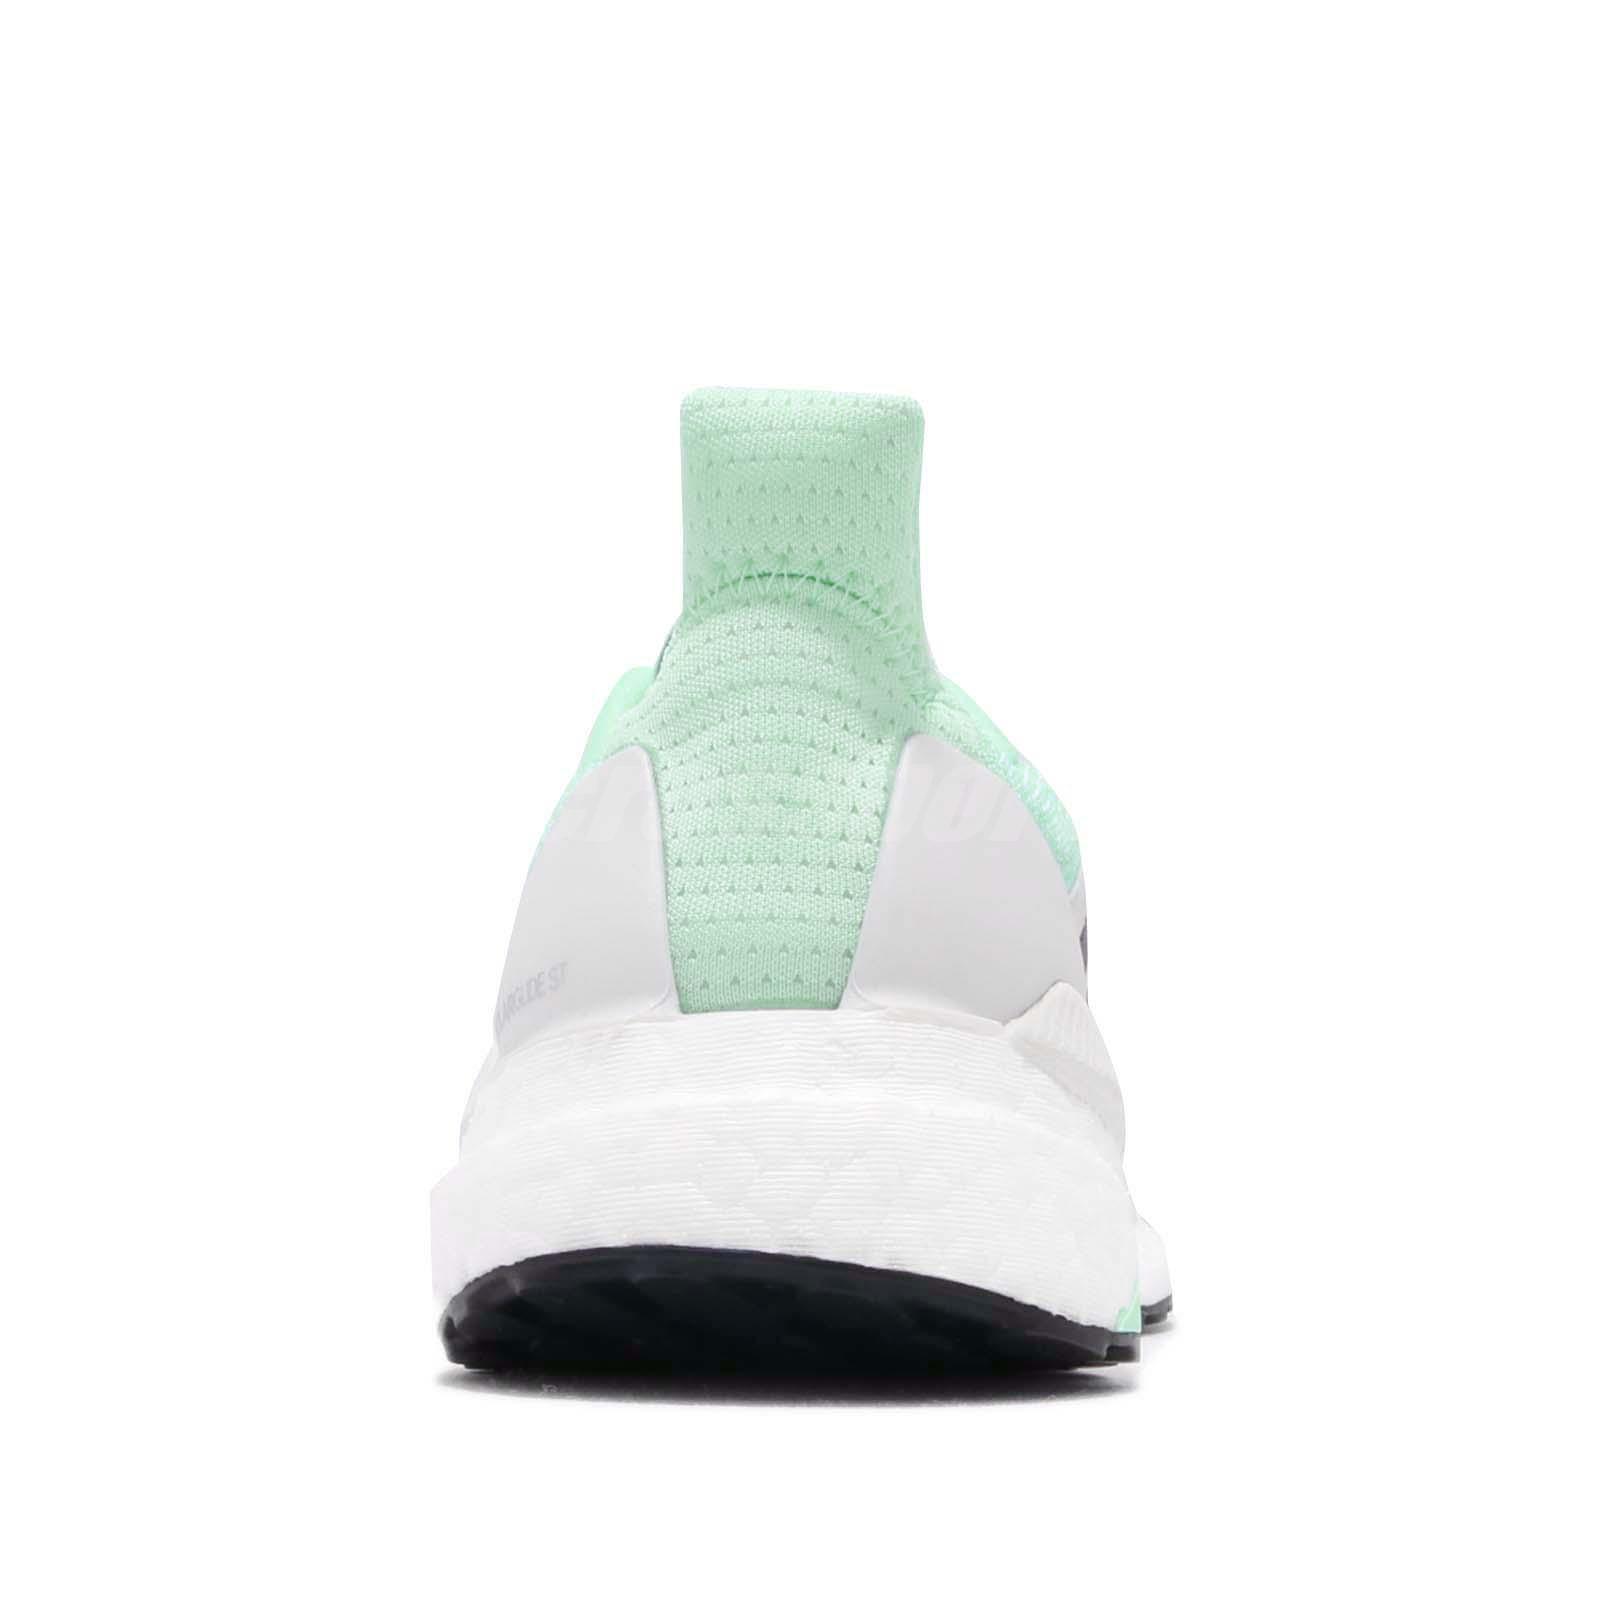 aafc152b762 Details about adidas Solar Glide ST W Clear Mint Legend Purple Grey Women  Running Shoes B96308